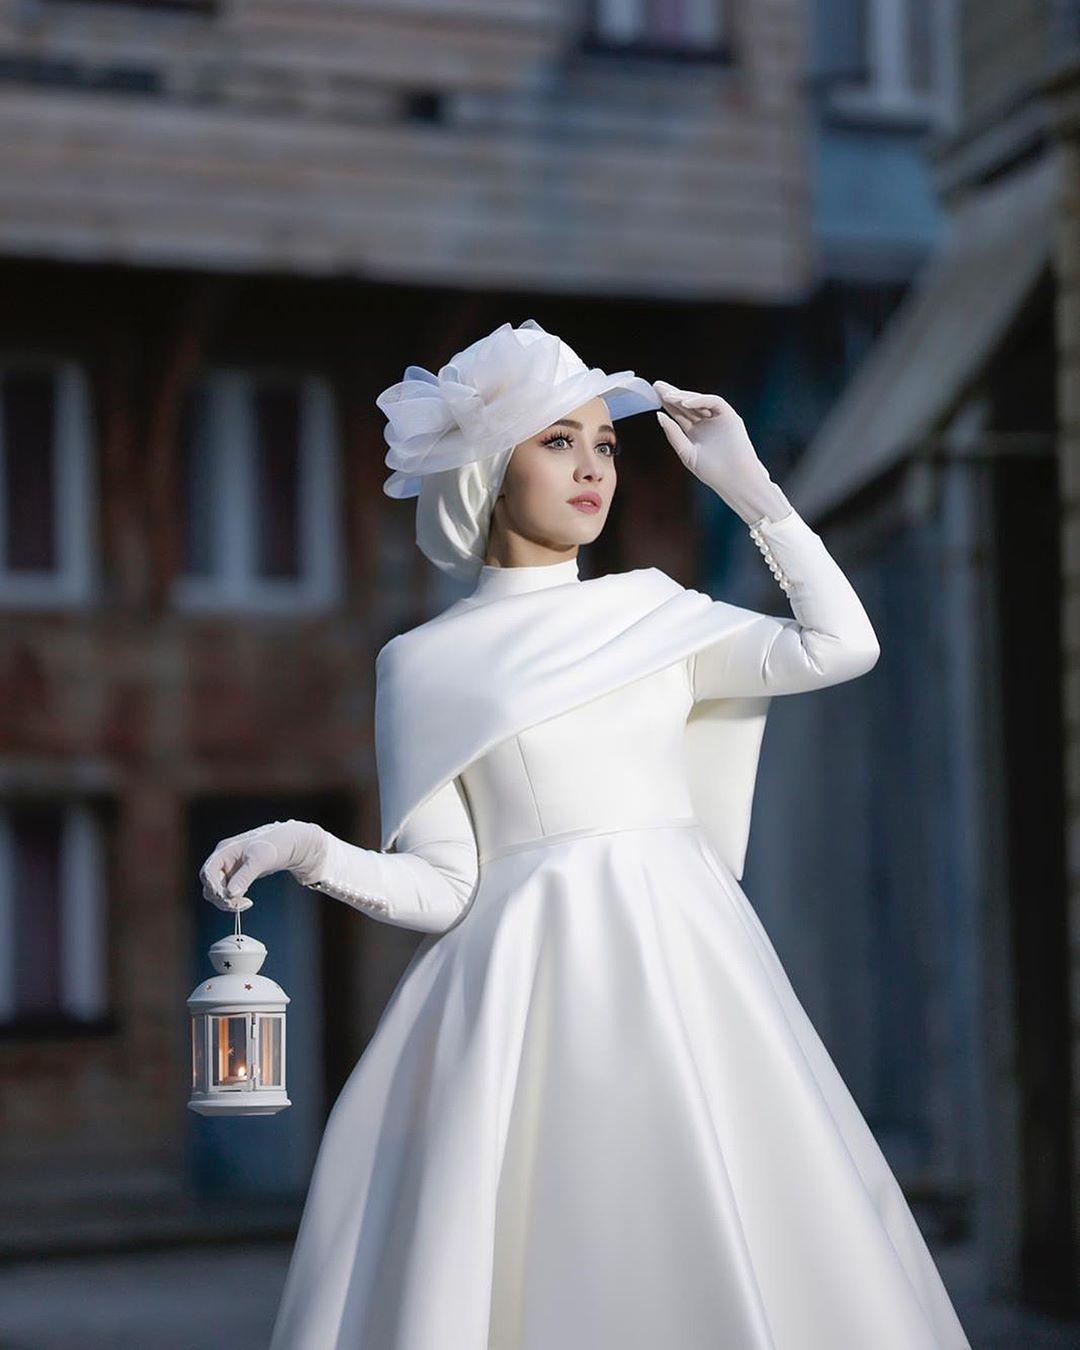 f239e0a1c Hijab Wedding Style - Hijab Wedding Dress - Hijab Wedding Photography  #hijab #hijabphotoshoot #photoshoot #muslimah #trend #fashion